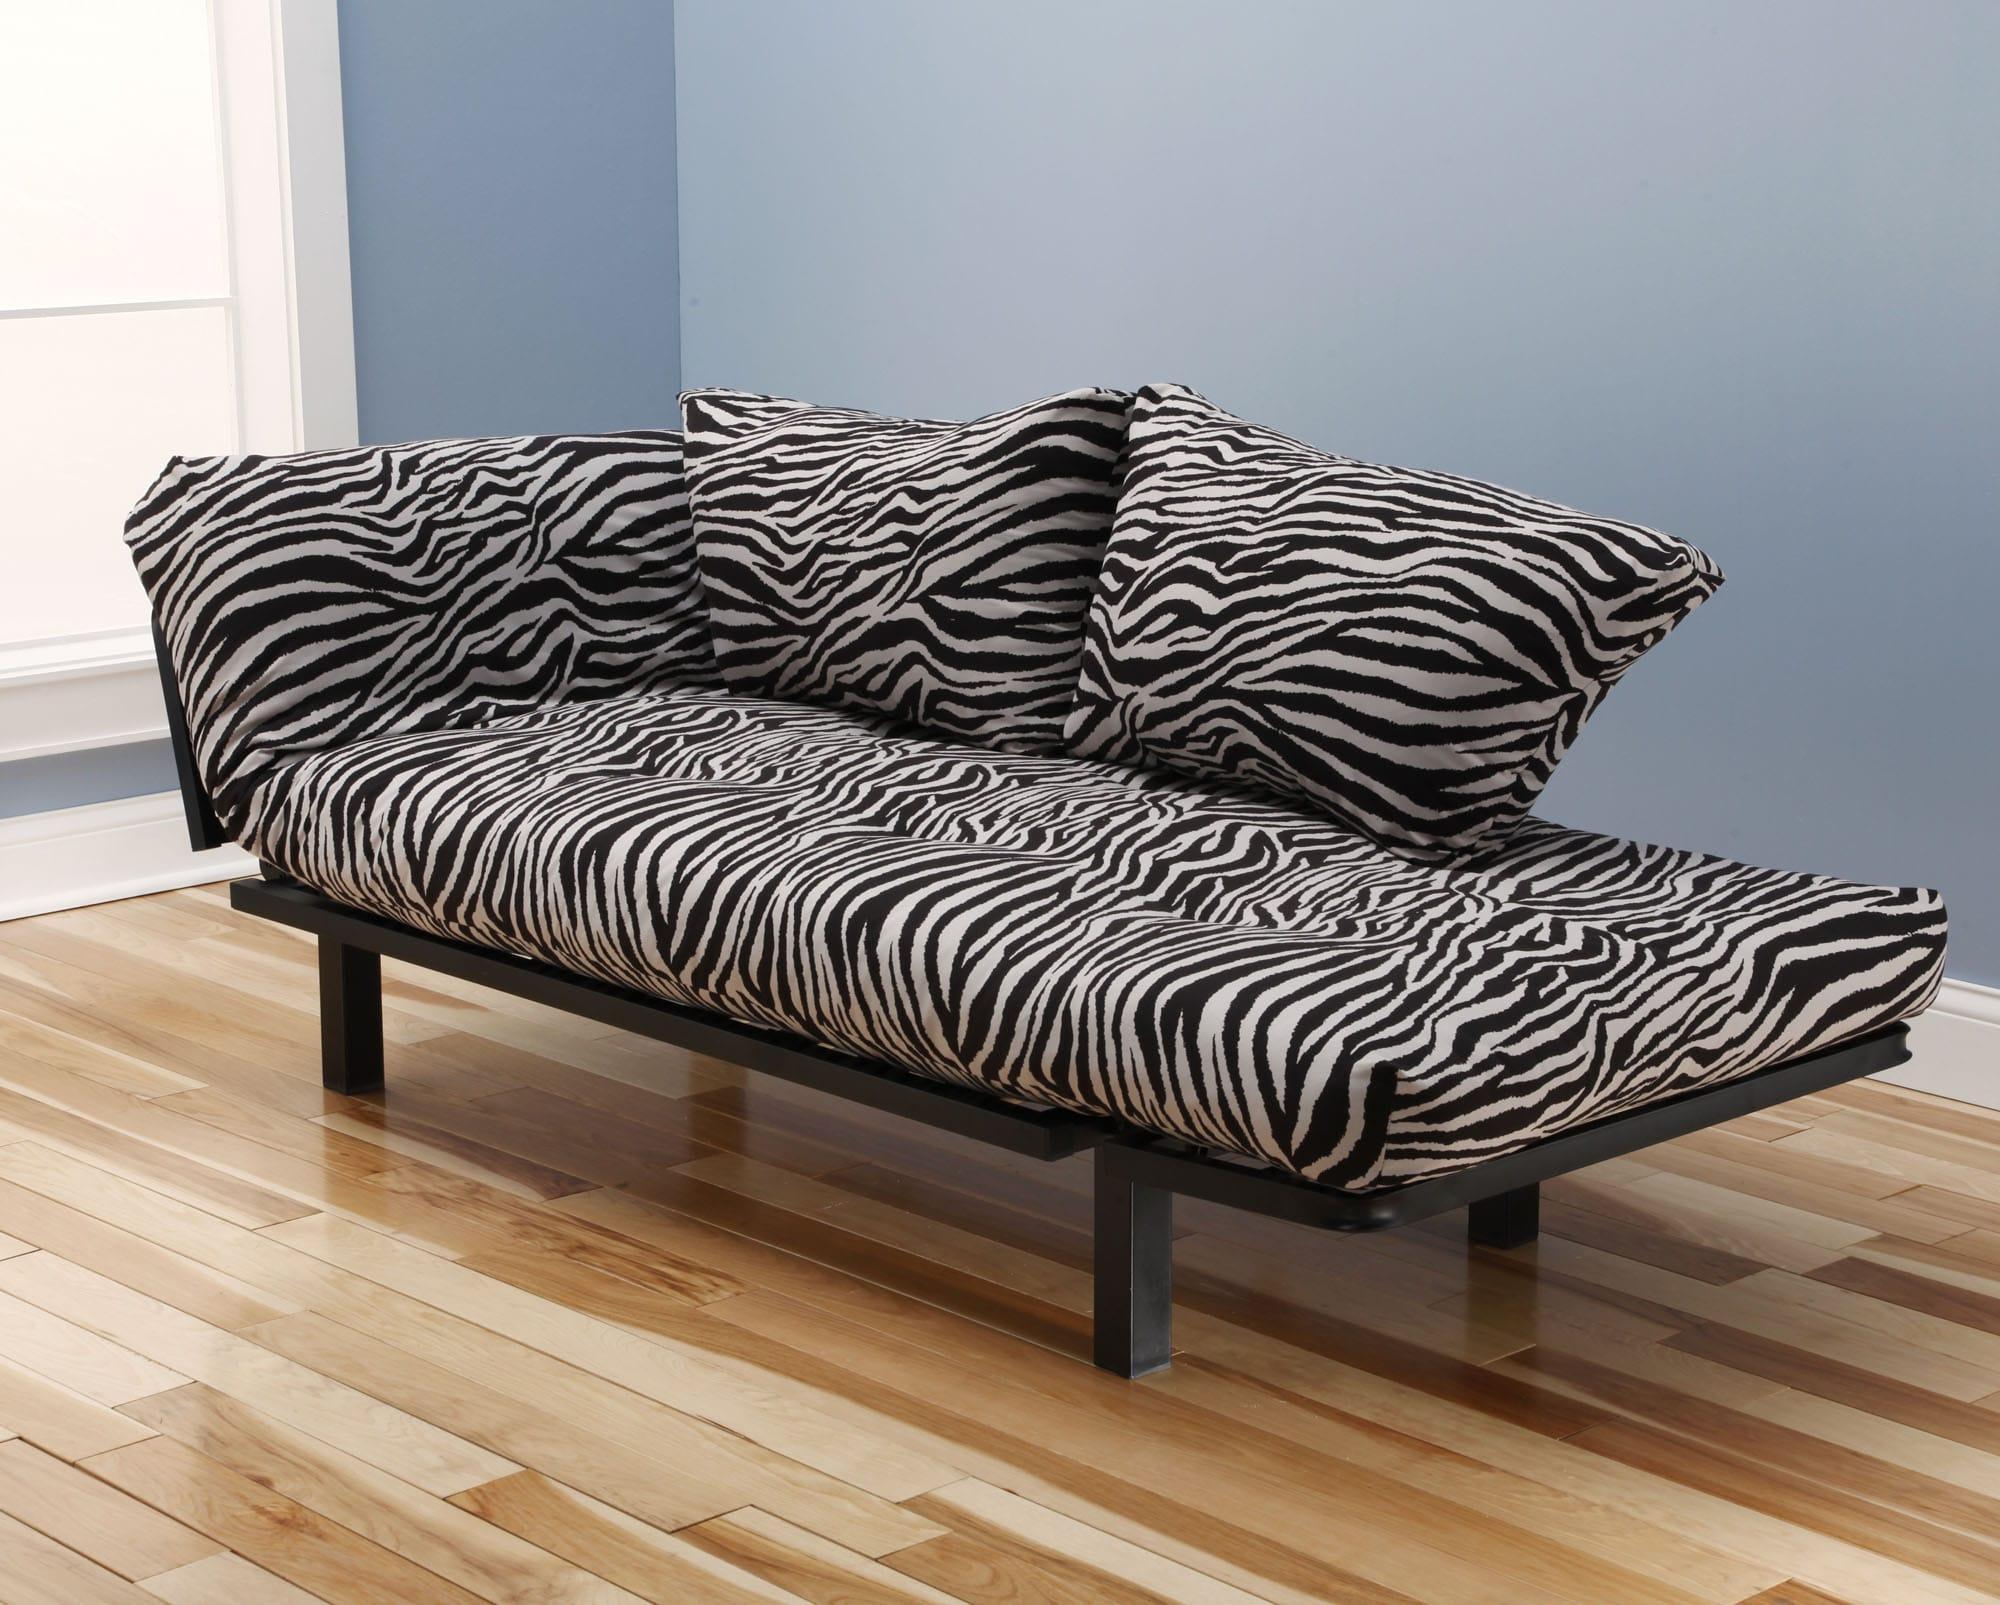 Zebra Futon